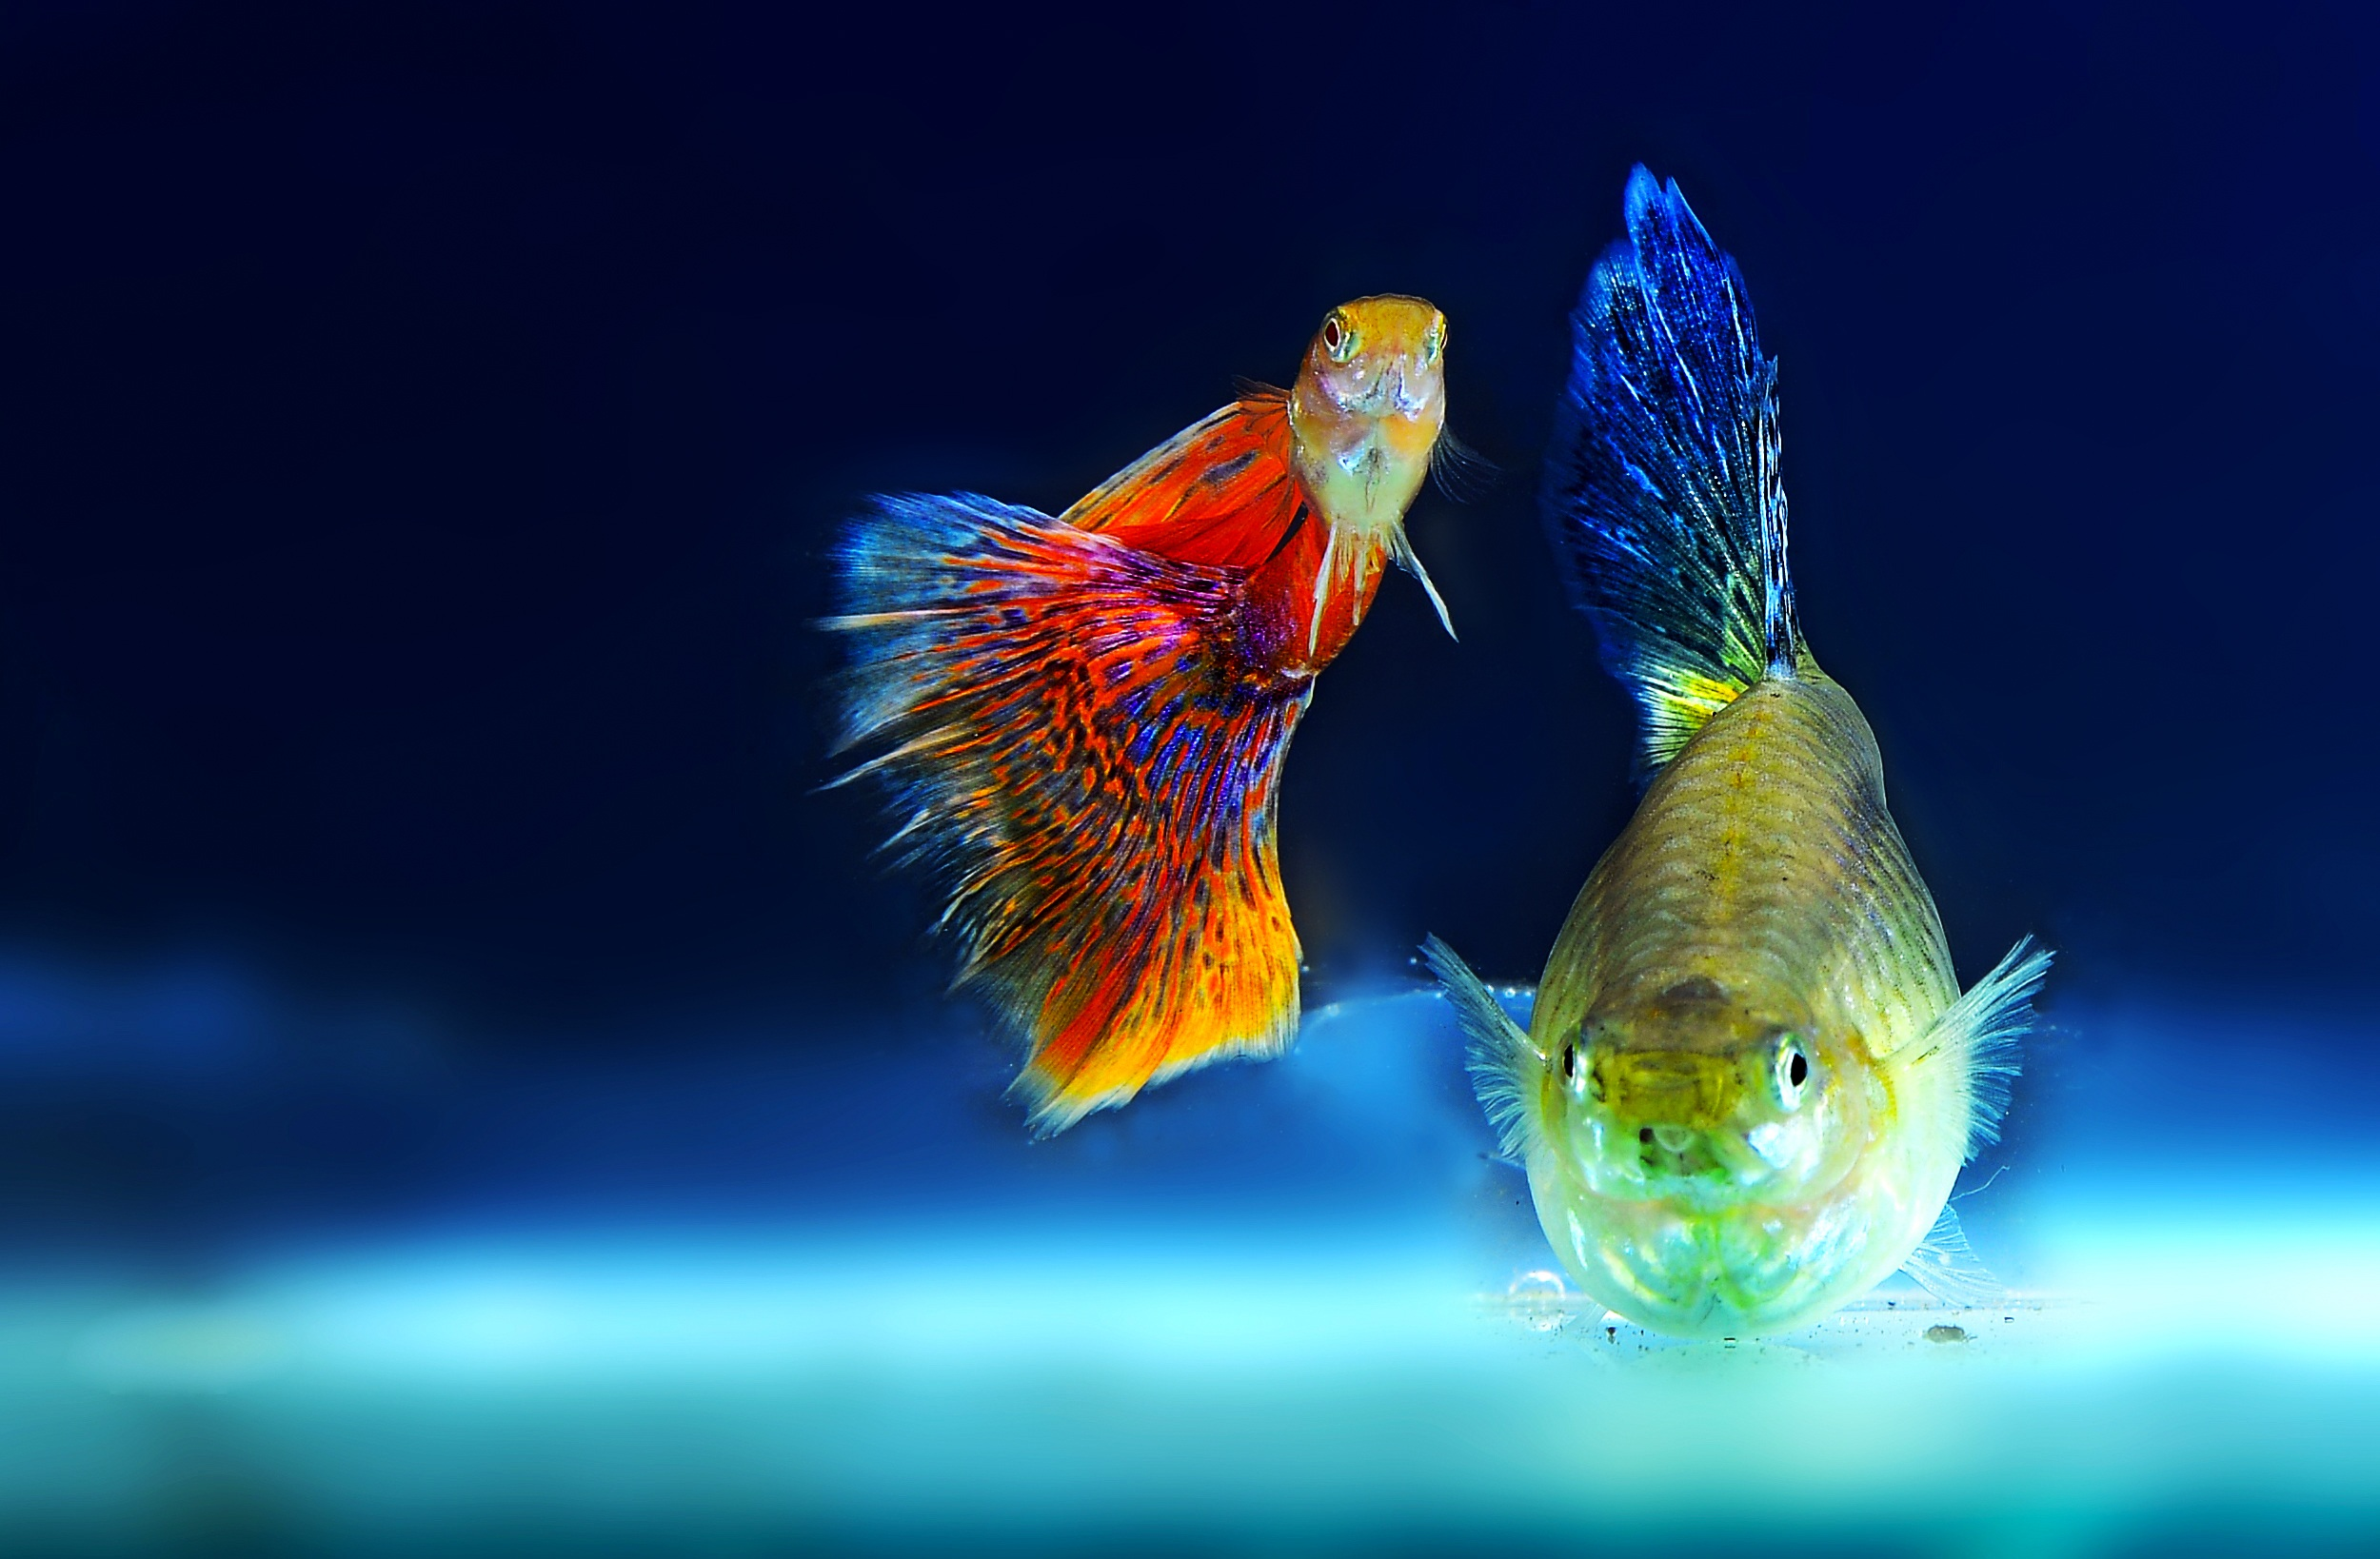 Free stock photo of aquarium fish ornamental fish for Ornamental fish tank